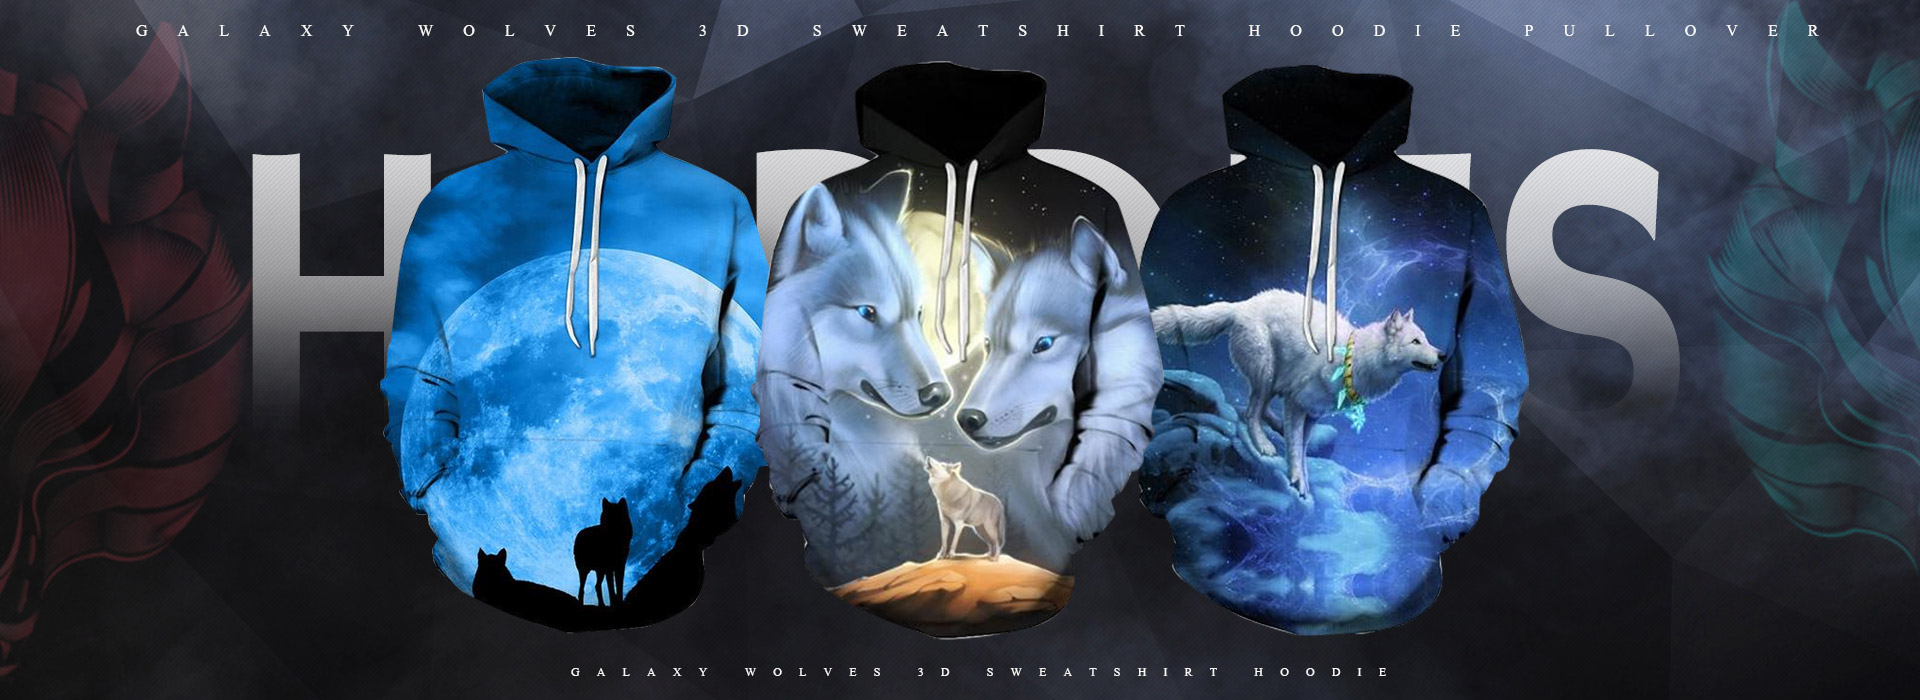 Image result for 3d hoodie banner designs